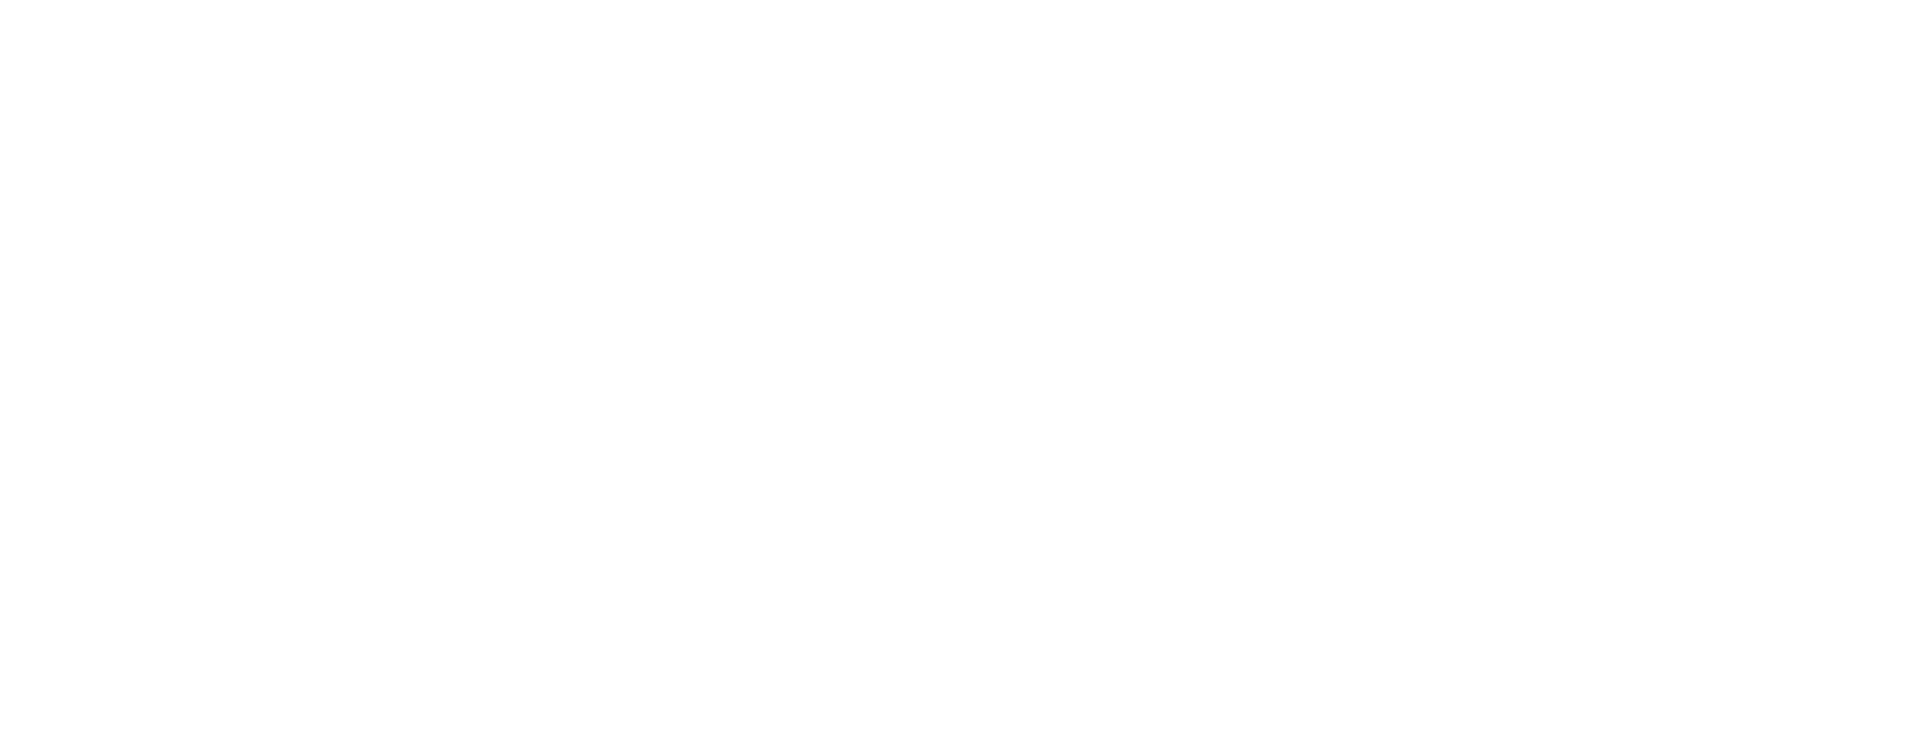 Prairie Provident Resources